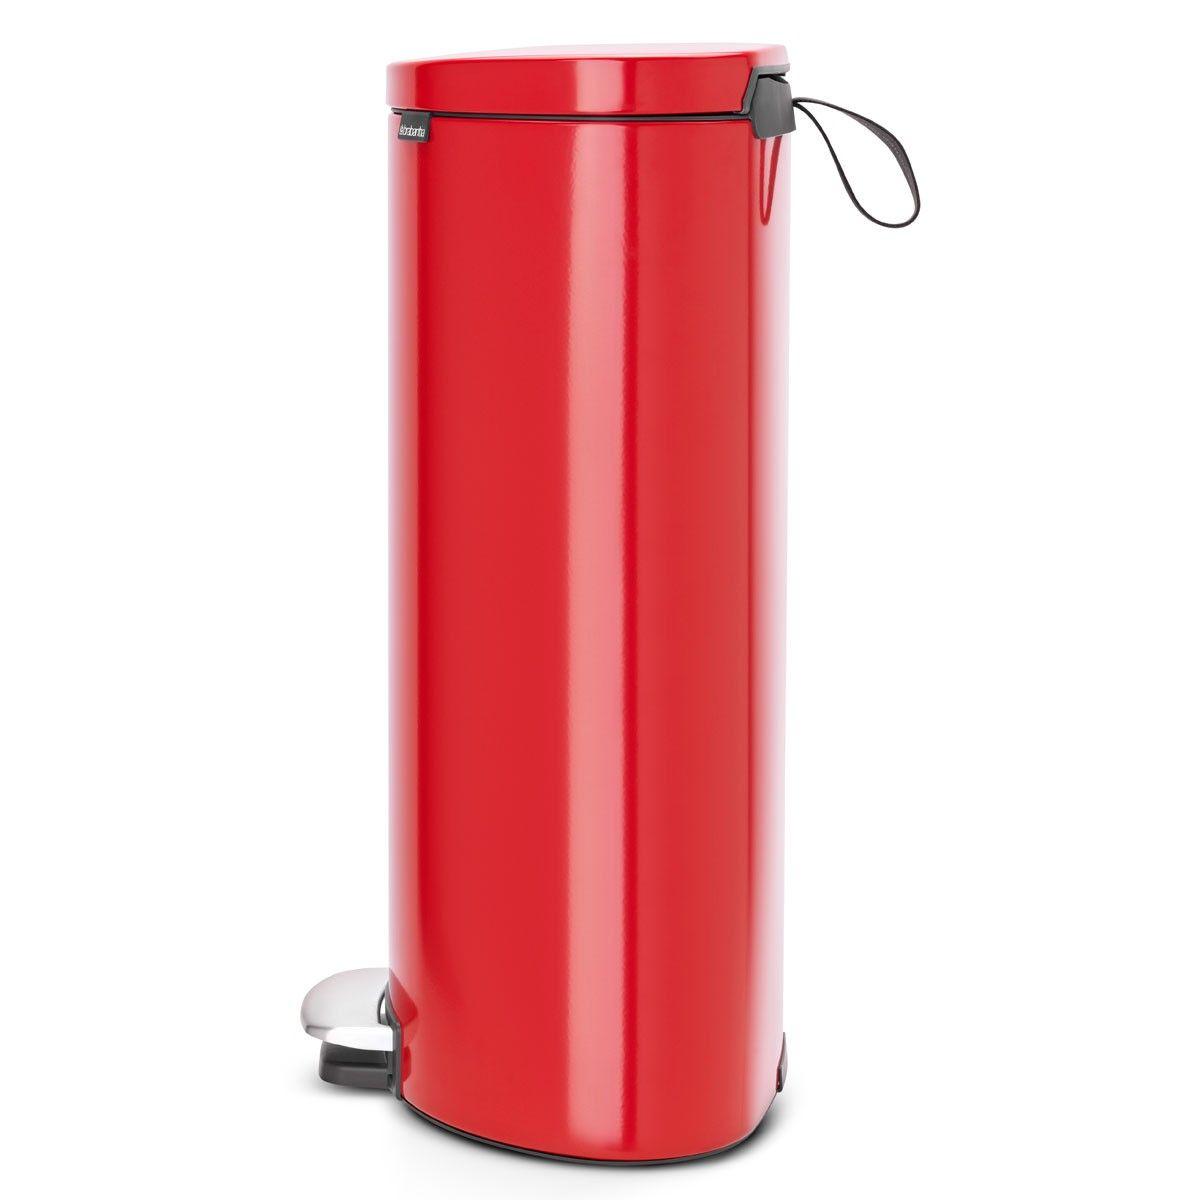 Brabantia Touch Bin Afvalverzamelaar 30 Liter.פח פדל אובלי Flatback גב שטוח 30 ליטר אדום תשוקה Brabantia פחי